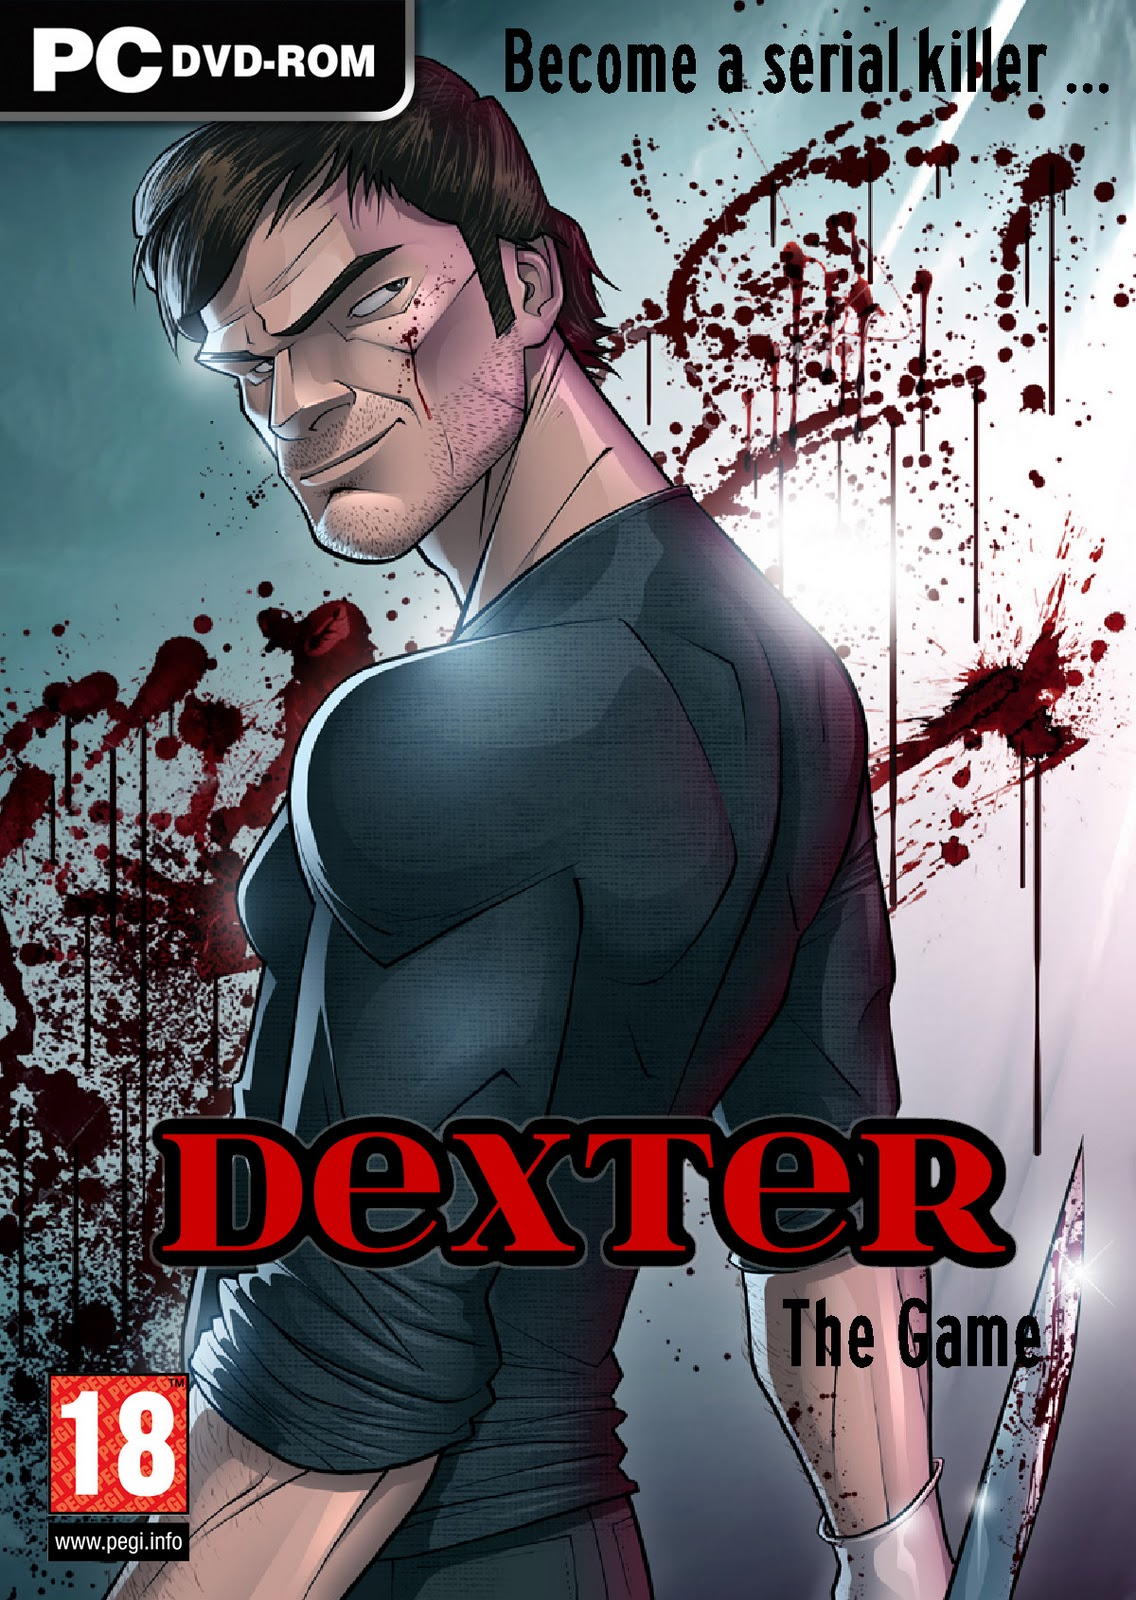 http://2.bp.blogspot.com/-f8JjBtFut-c/TYItegzD8cI/AAAAAAAAAGY/uJsWhce4EWc/s1600/Dexter-PC-DVD.jpg